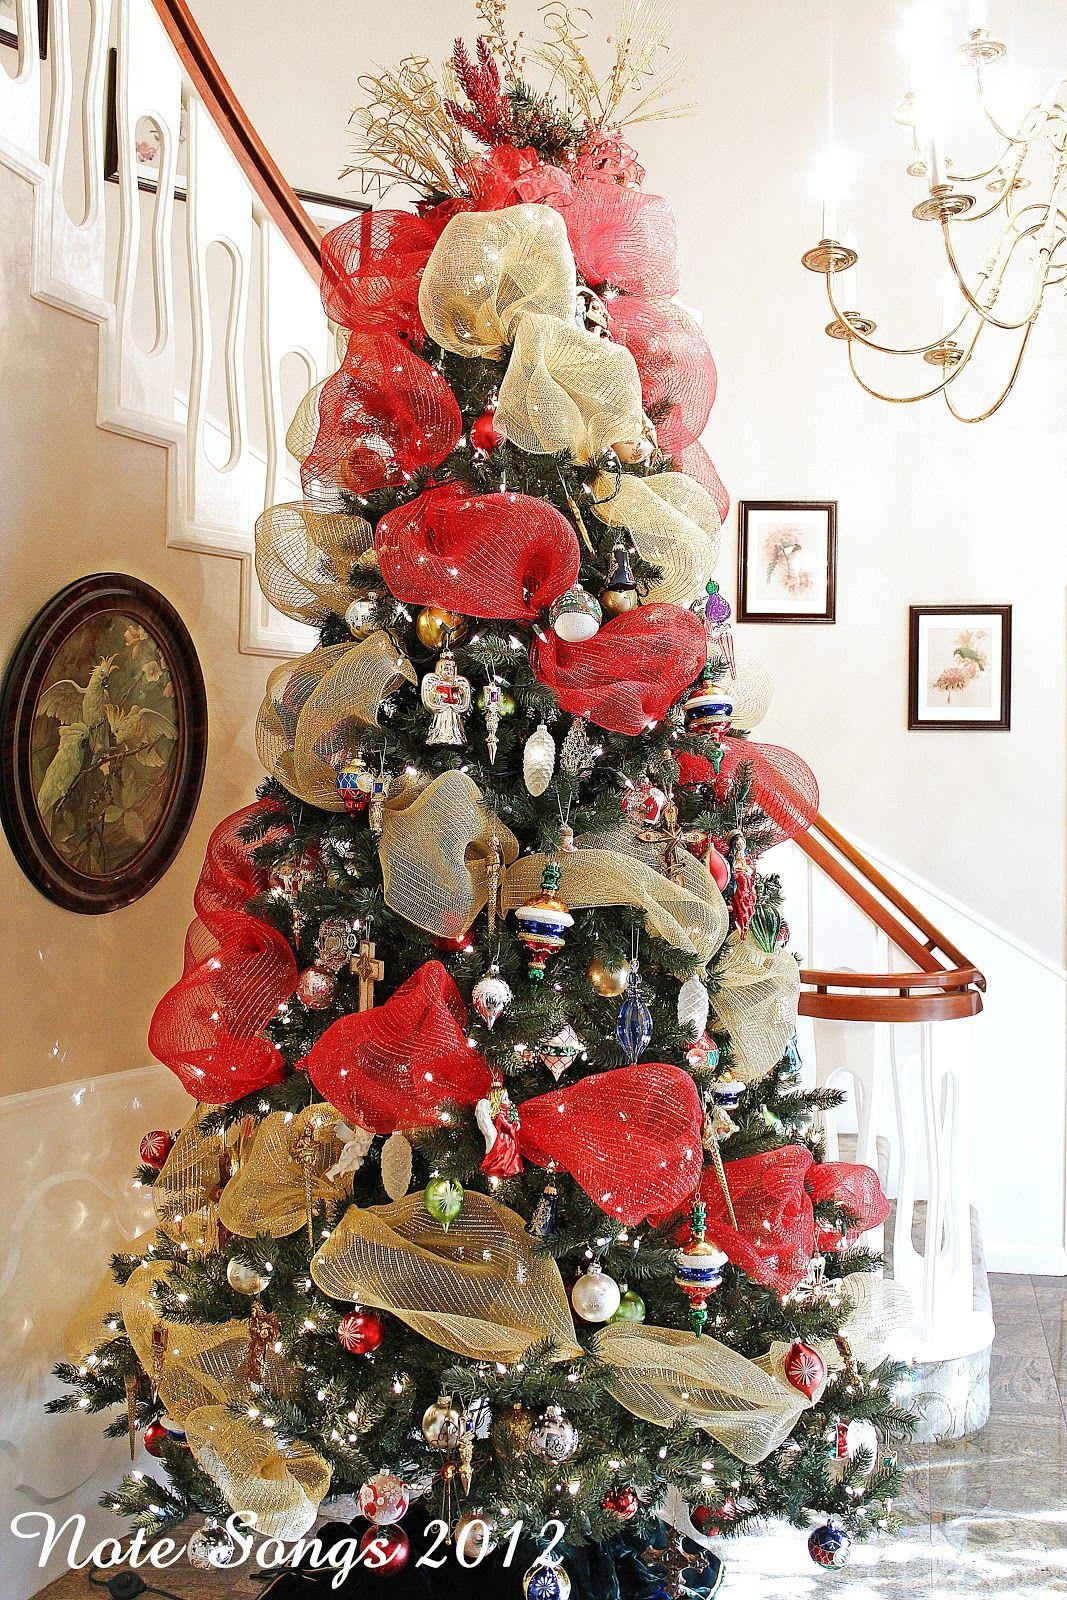 Note Songs My Christmas Tree Mesh christmas tree